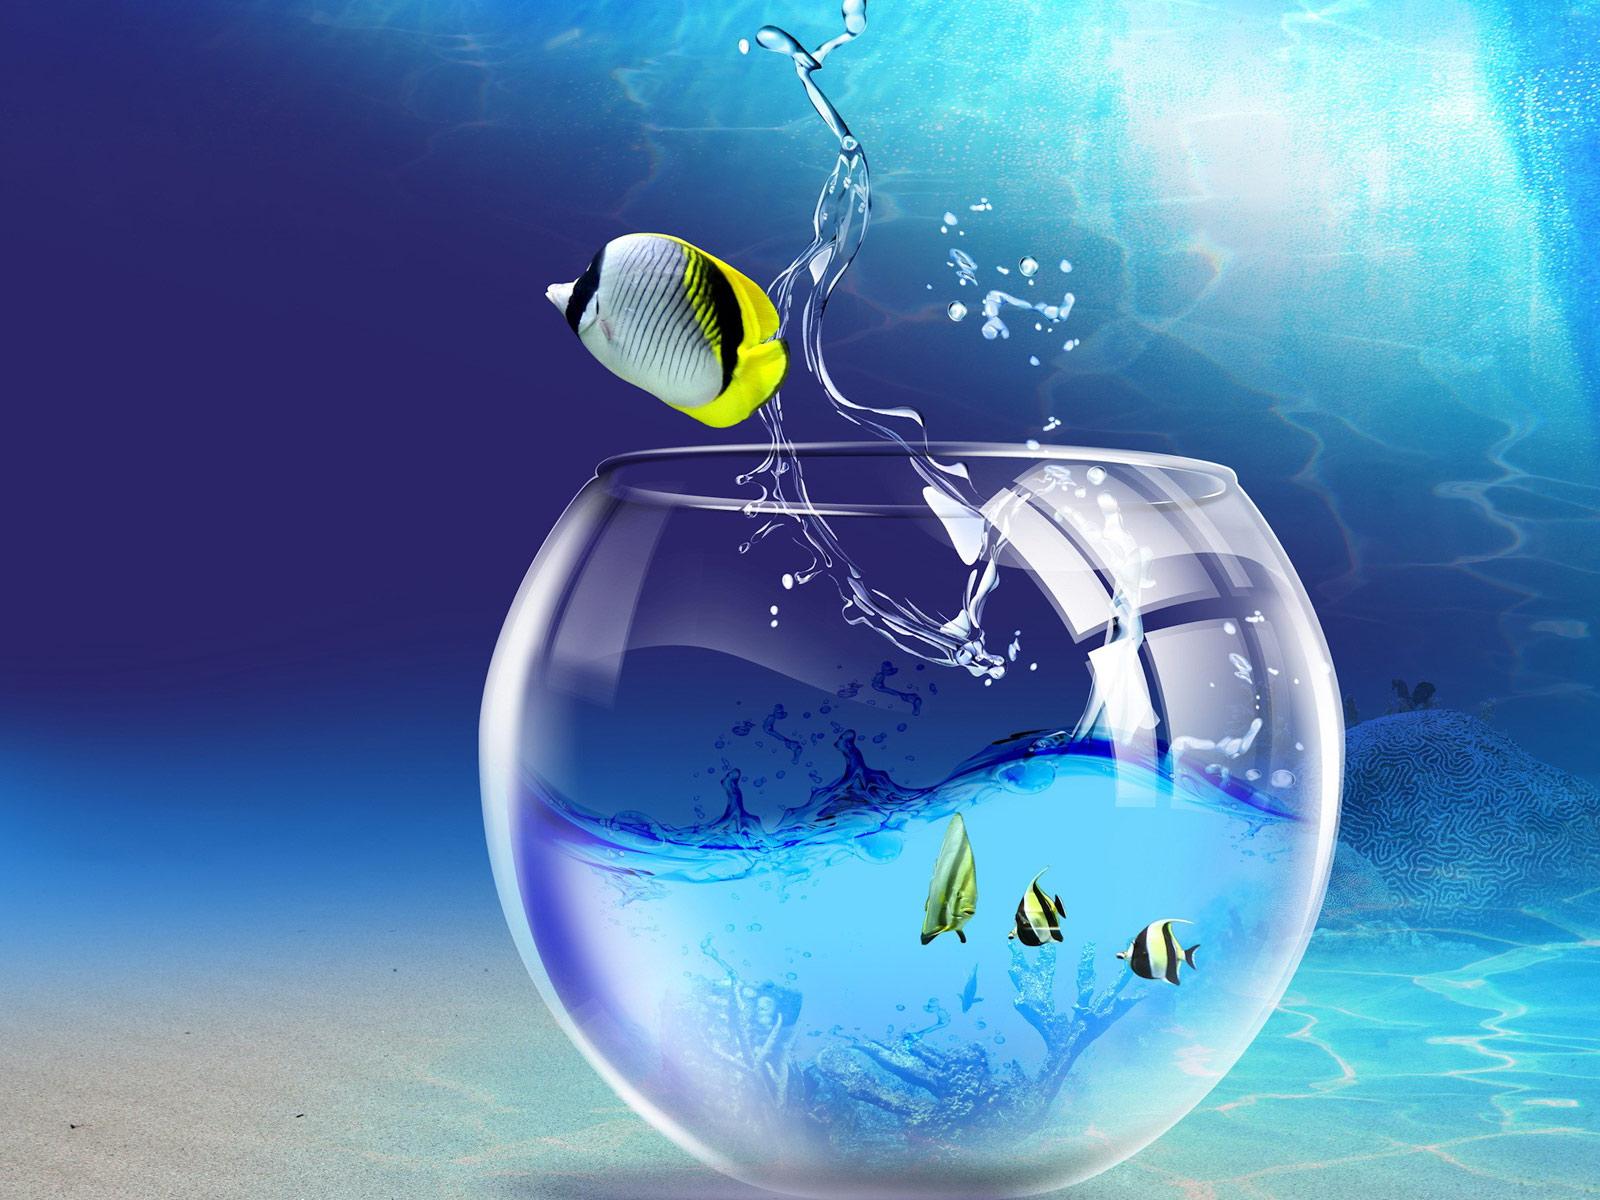 http://2.bp.blogspot.com/-3ZAZP8wjpfQ/TpHbwg2guwI/AAAAAAAAANQ/b-VjGnQxA7U/s1600/Animated+wallpaper+windows+7+1.jpg